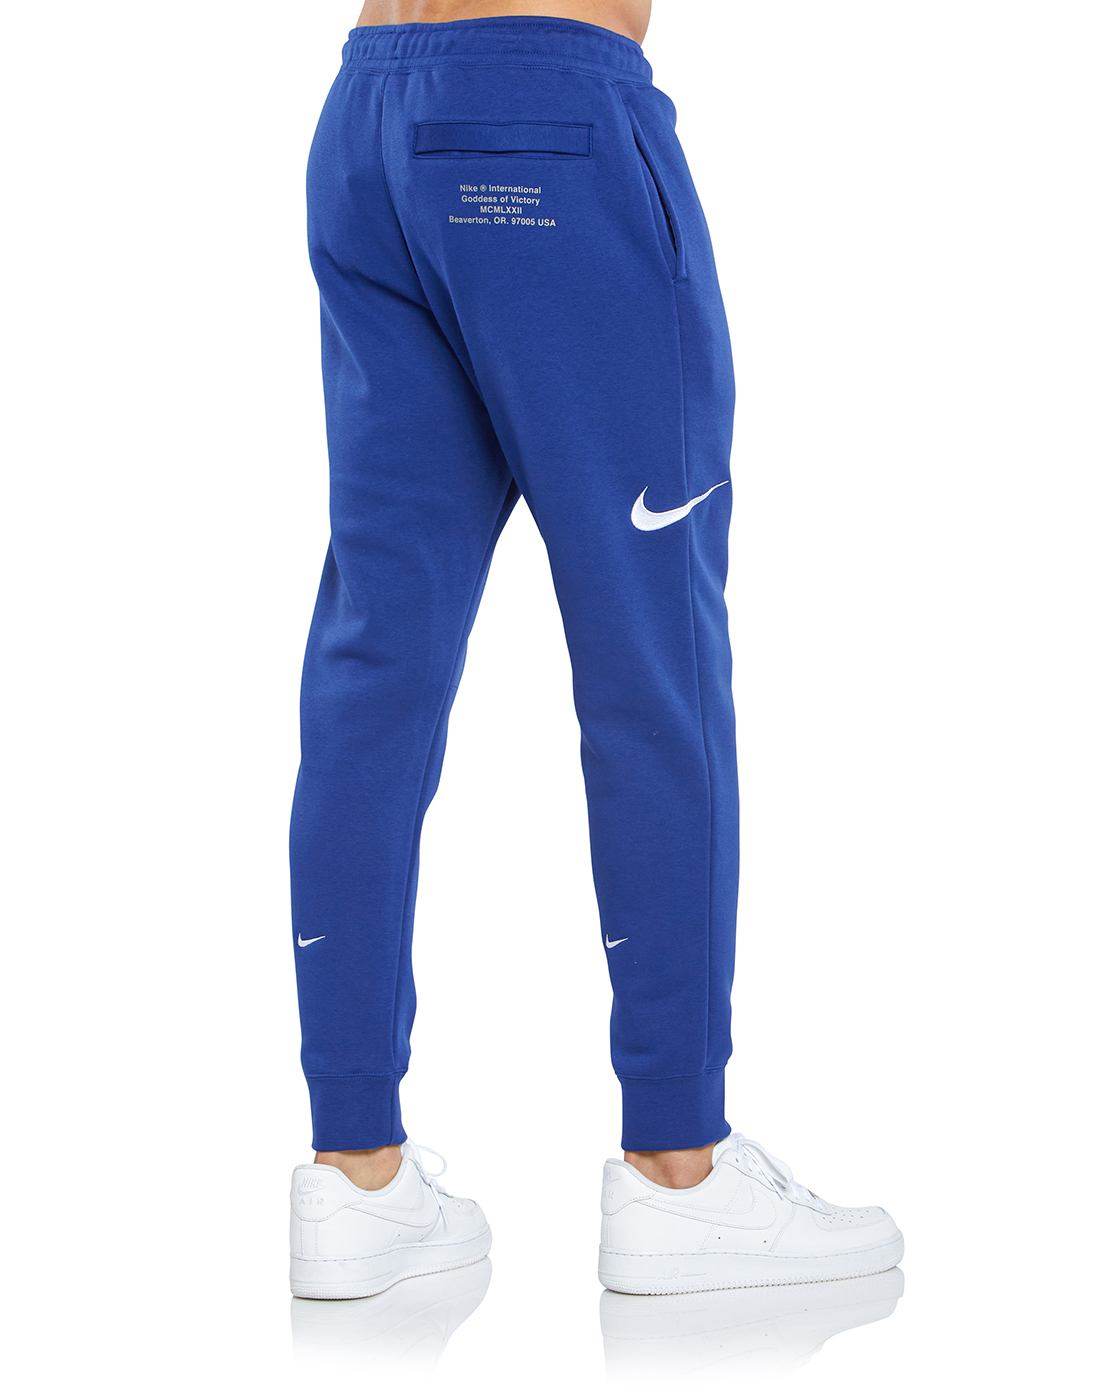 localizar Prestador aeropuerto  Nike Mens Swoosh Pants - Blue | Life Style Sports IE